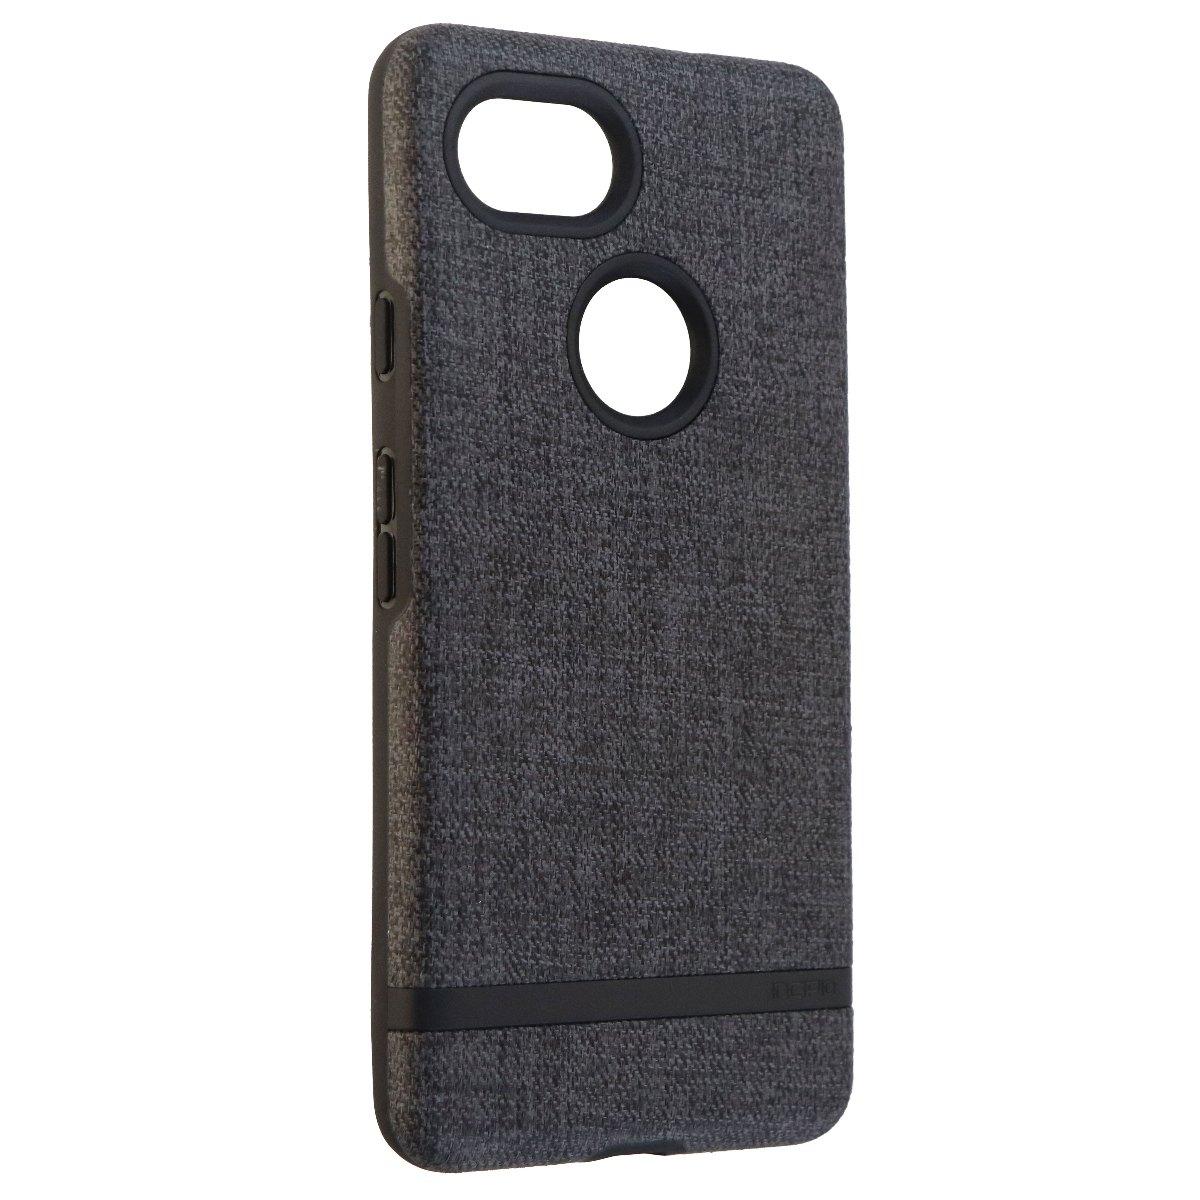 Incipio Esquire Series Hard Fabric Case for Google Pixel 2 XL - Dark Gray/Black